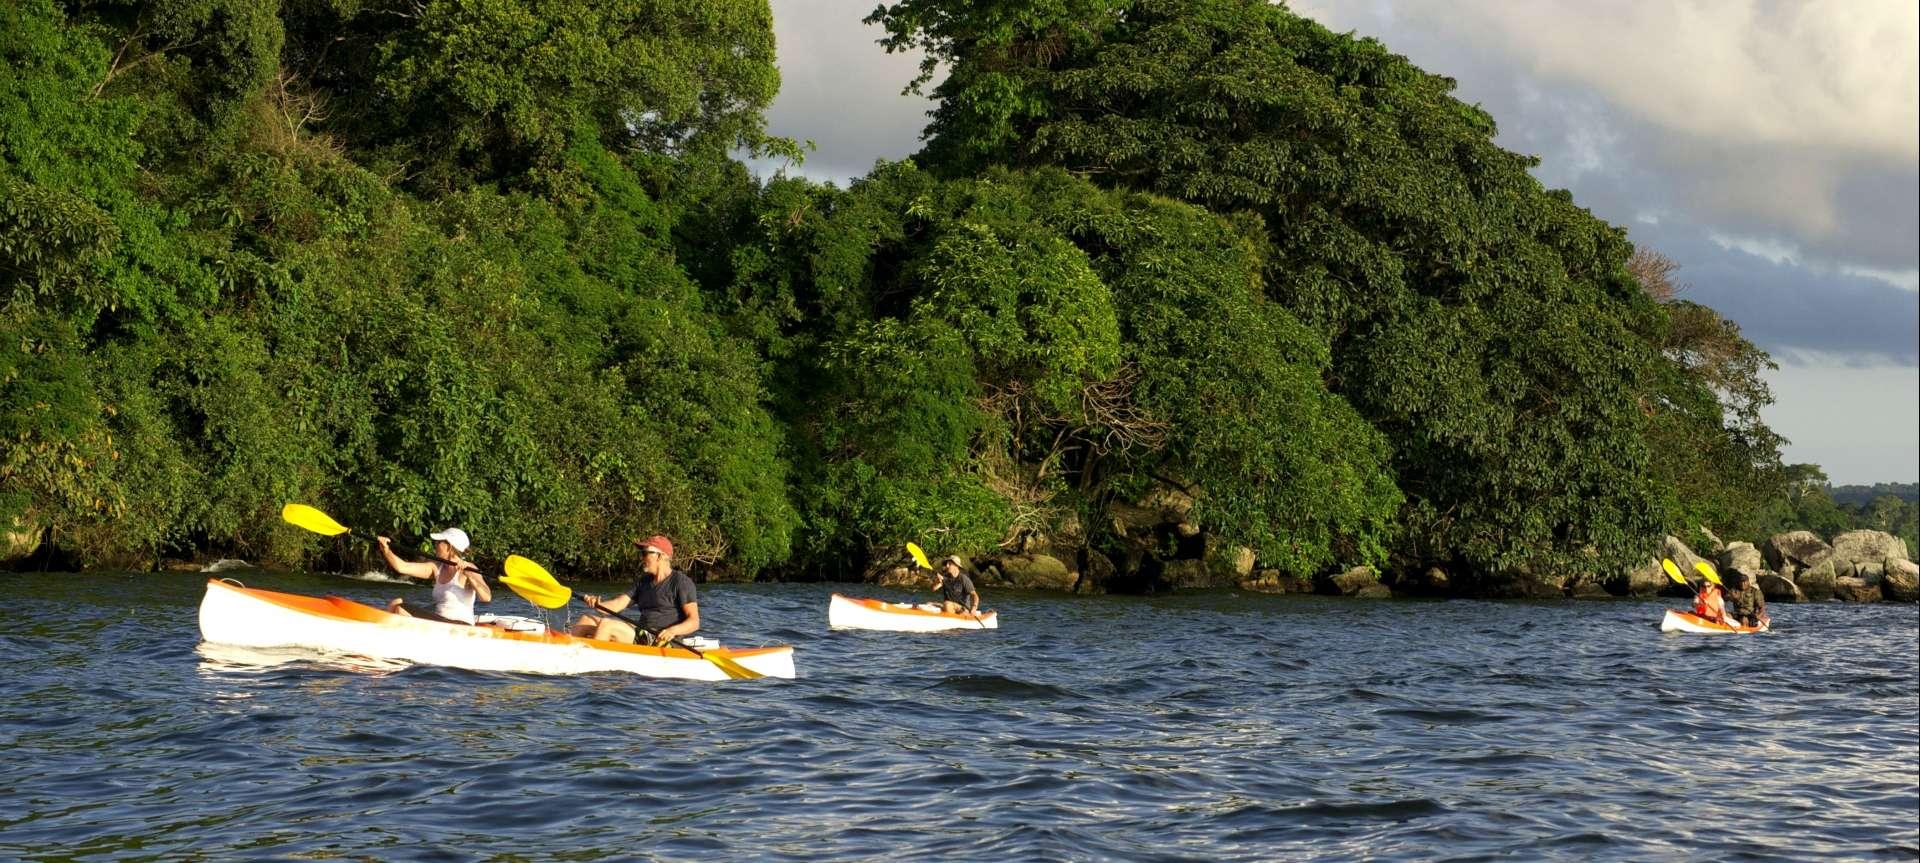 Rubondo Island - Africa Wildlife Safaris